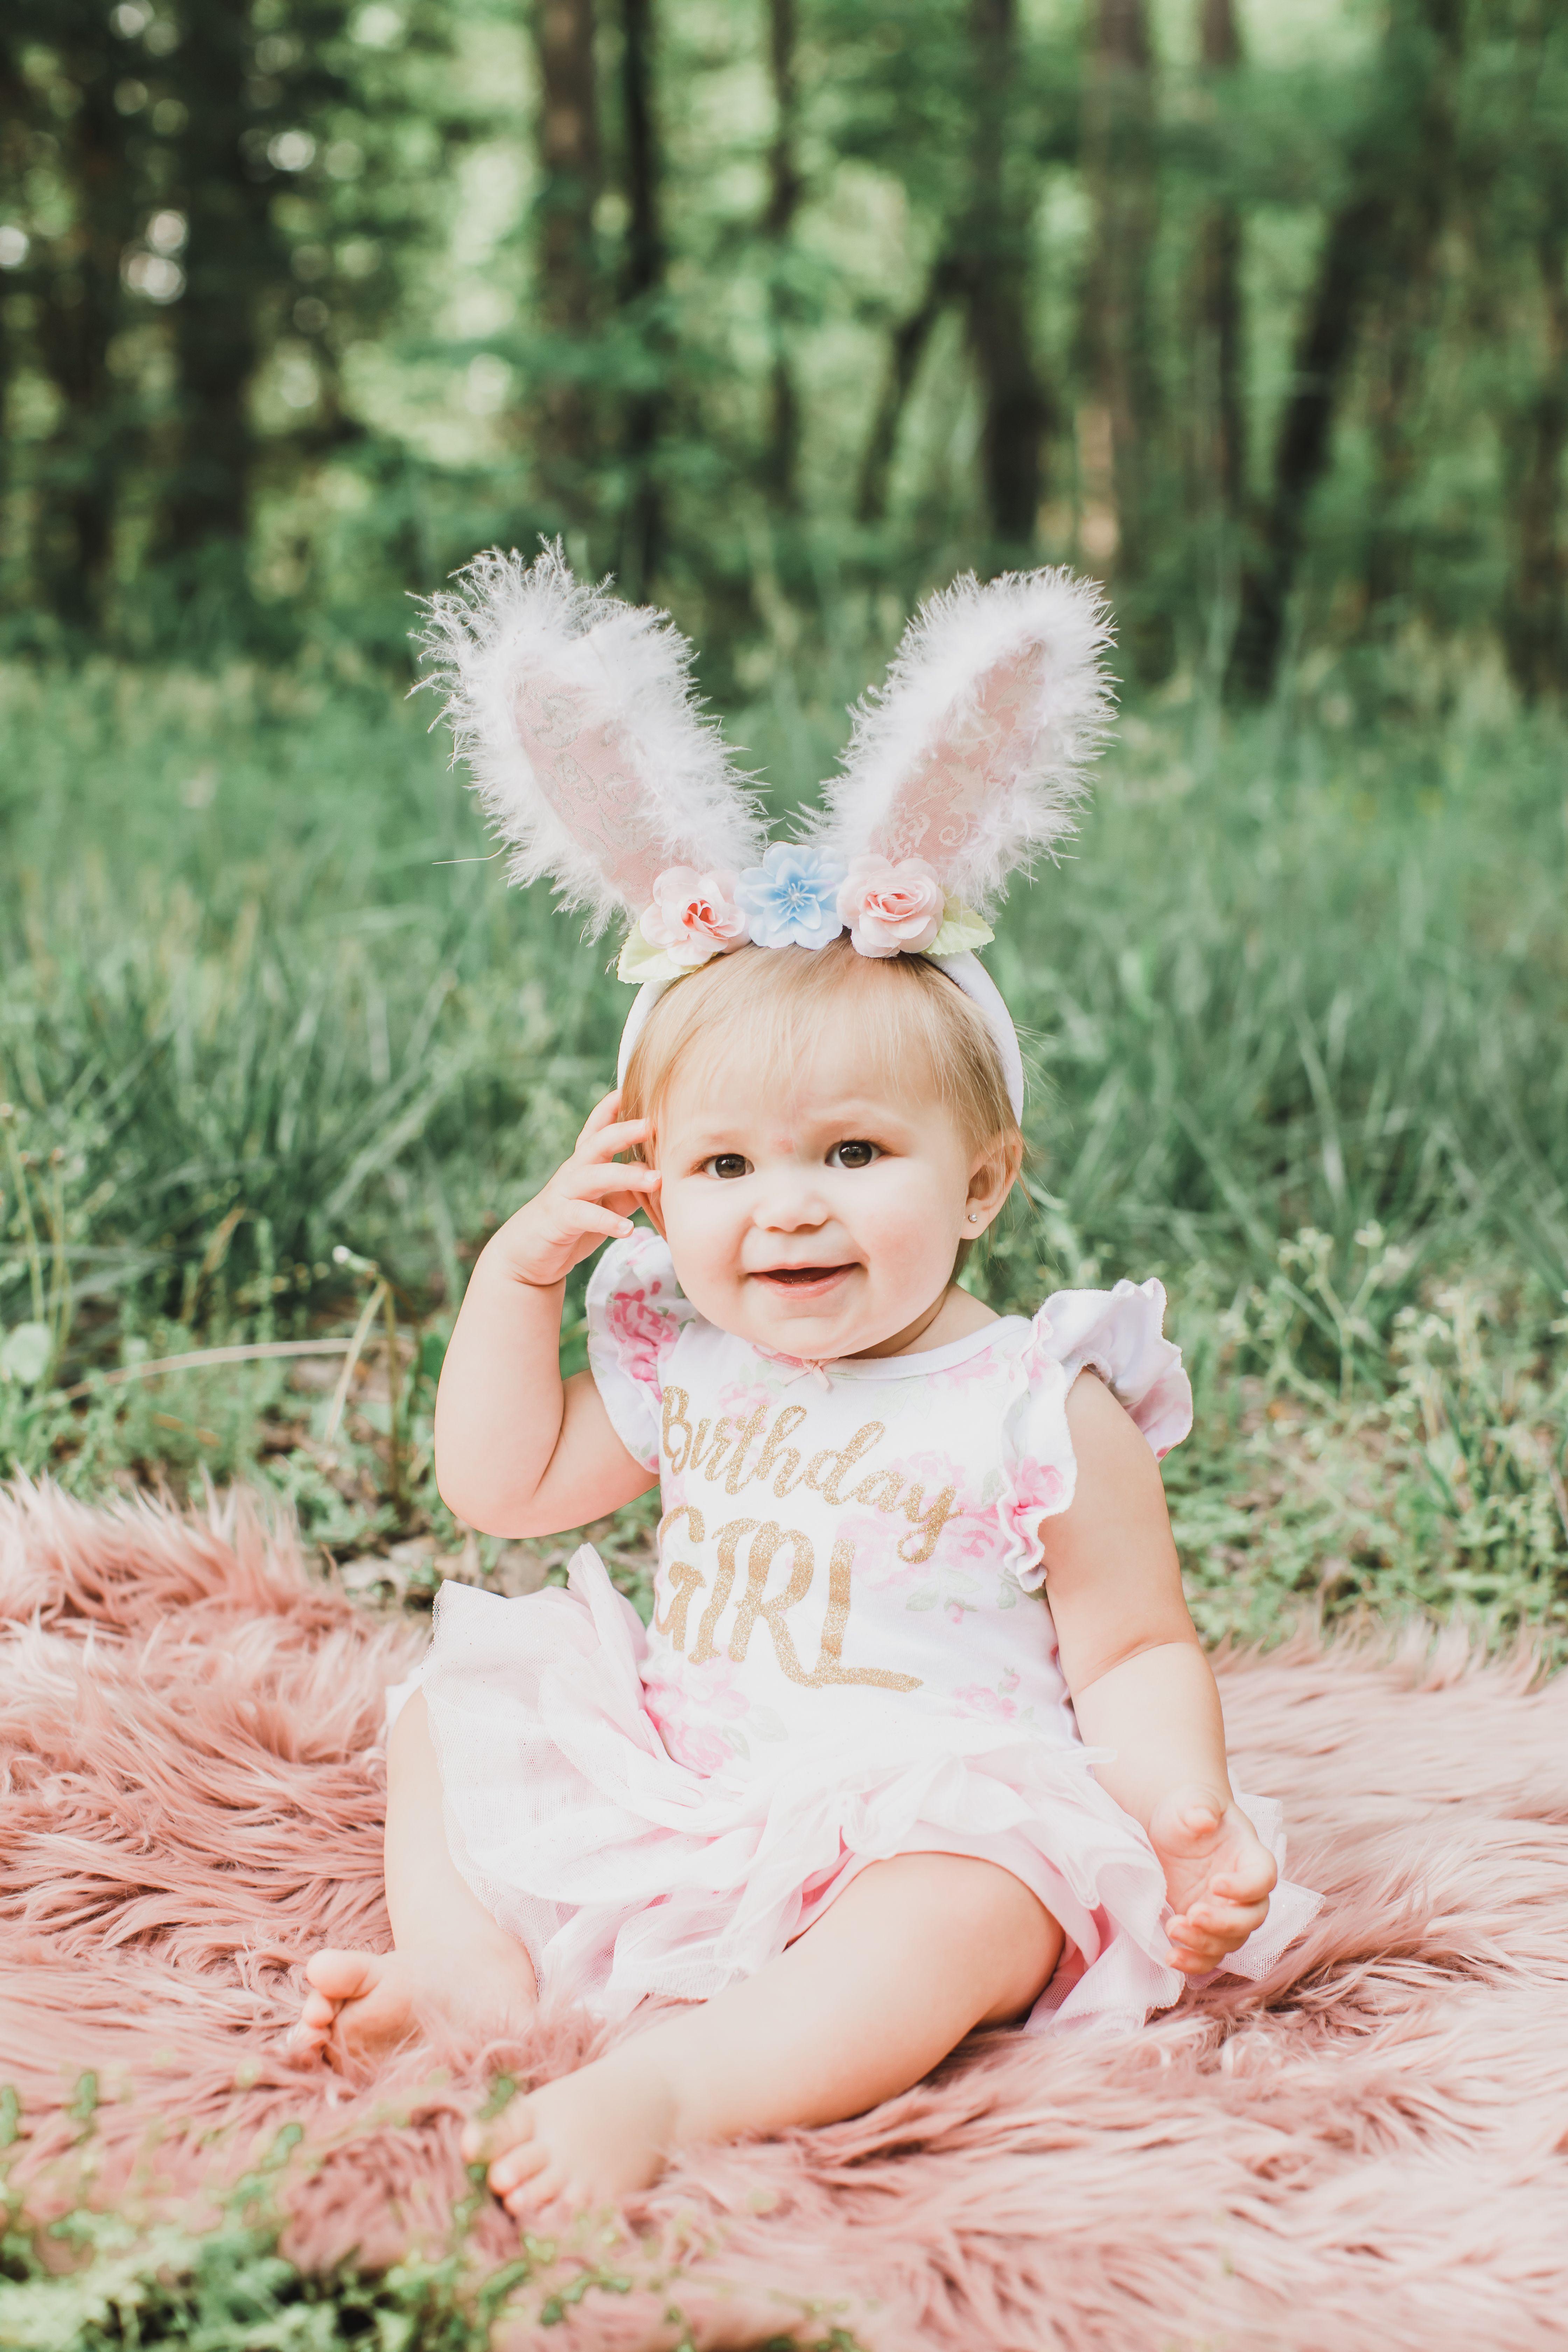 Little Girl Birthday Photography In 2020 Little Girl Photography Little Girl Photos Easter Photoshoot